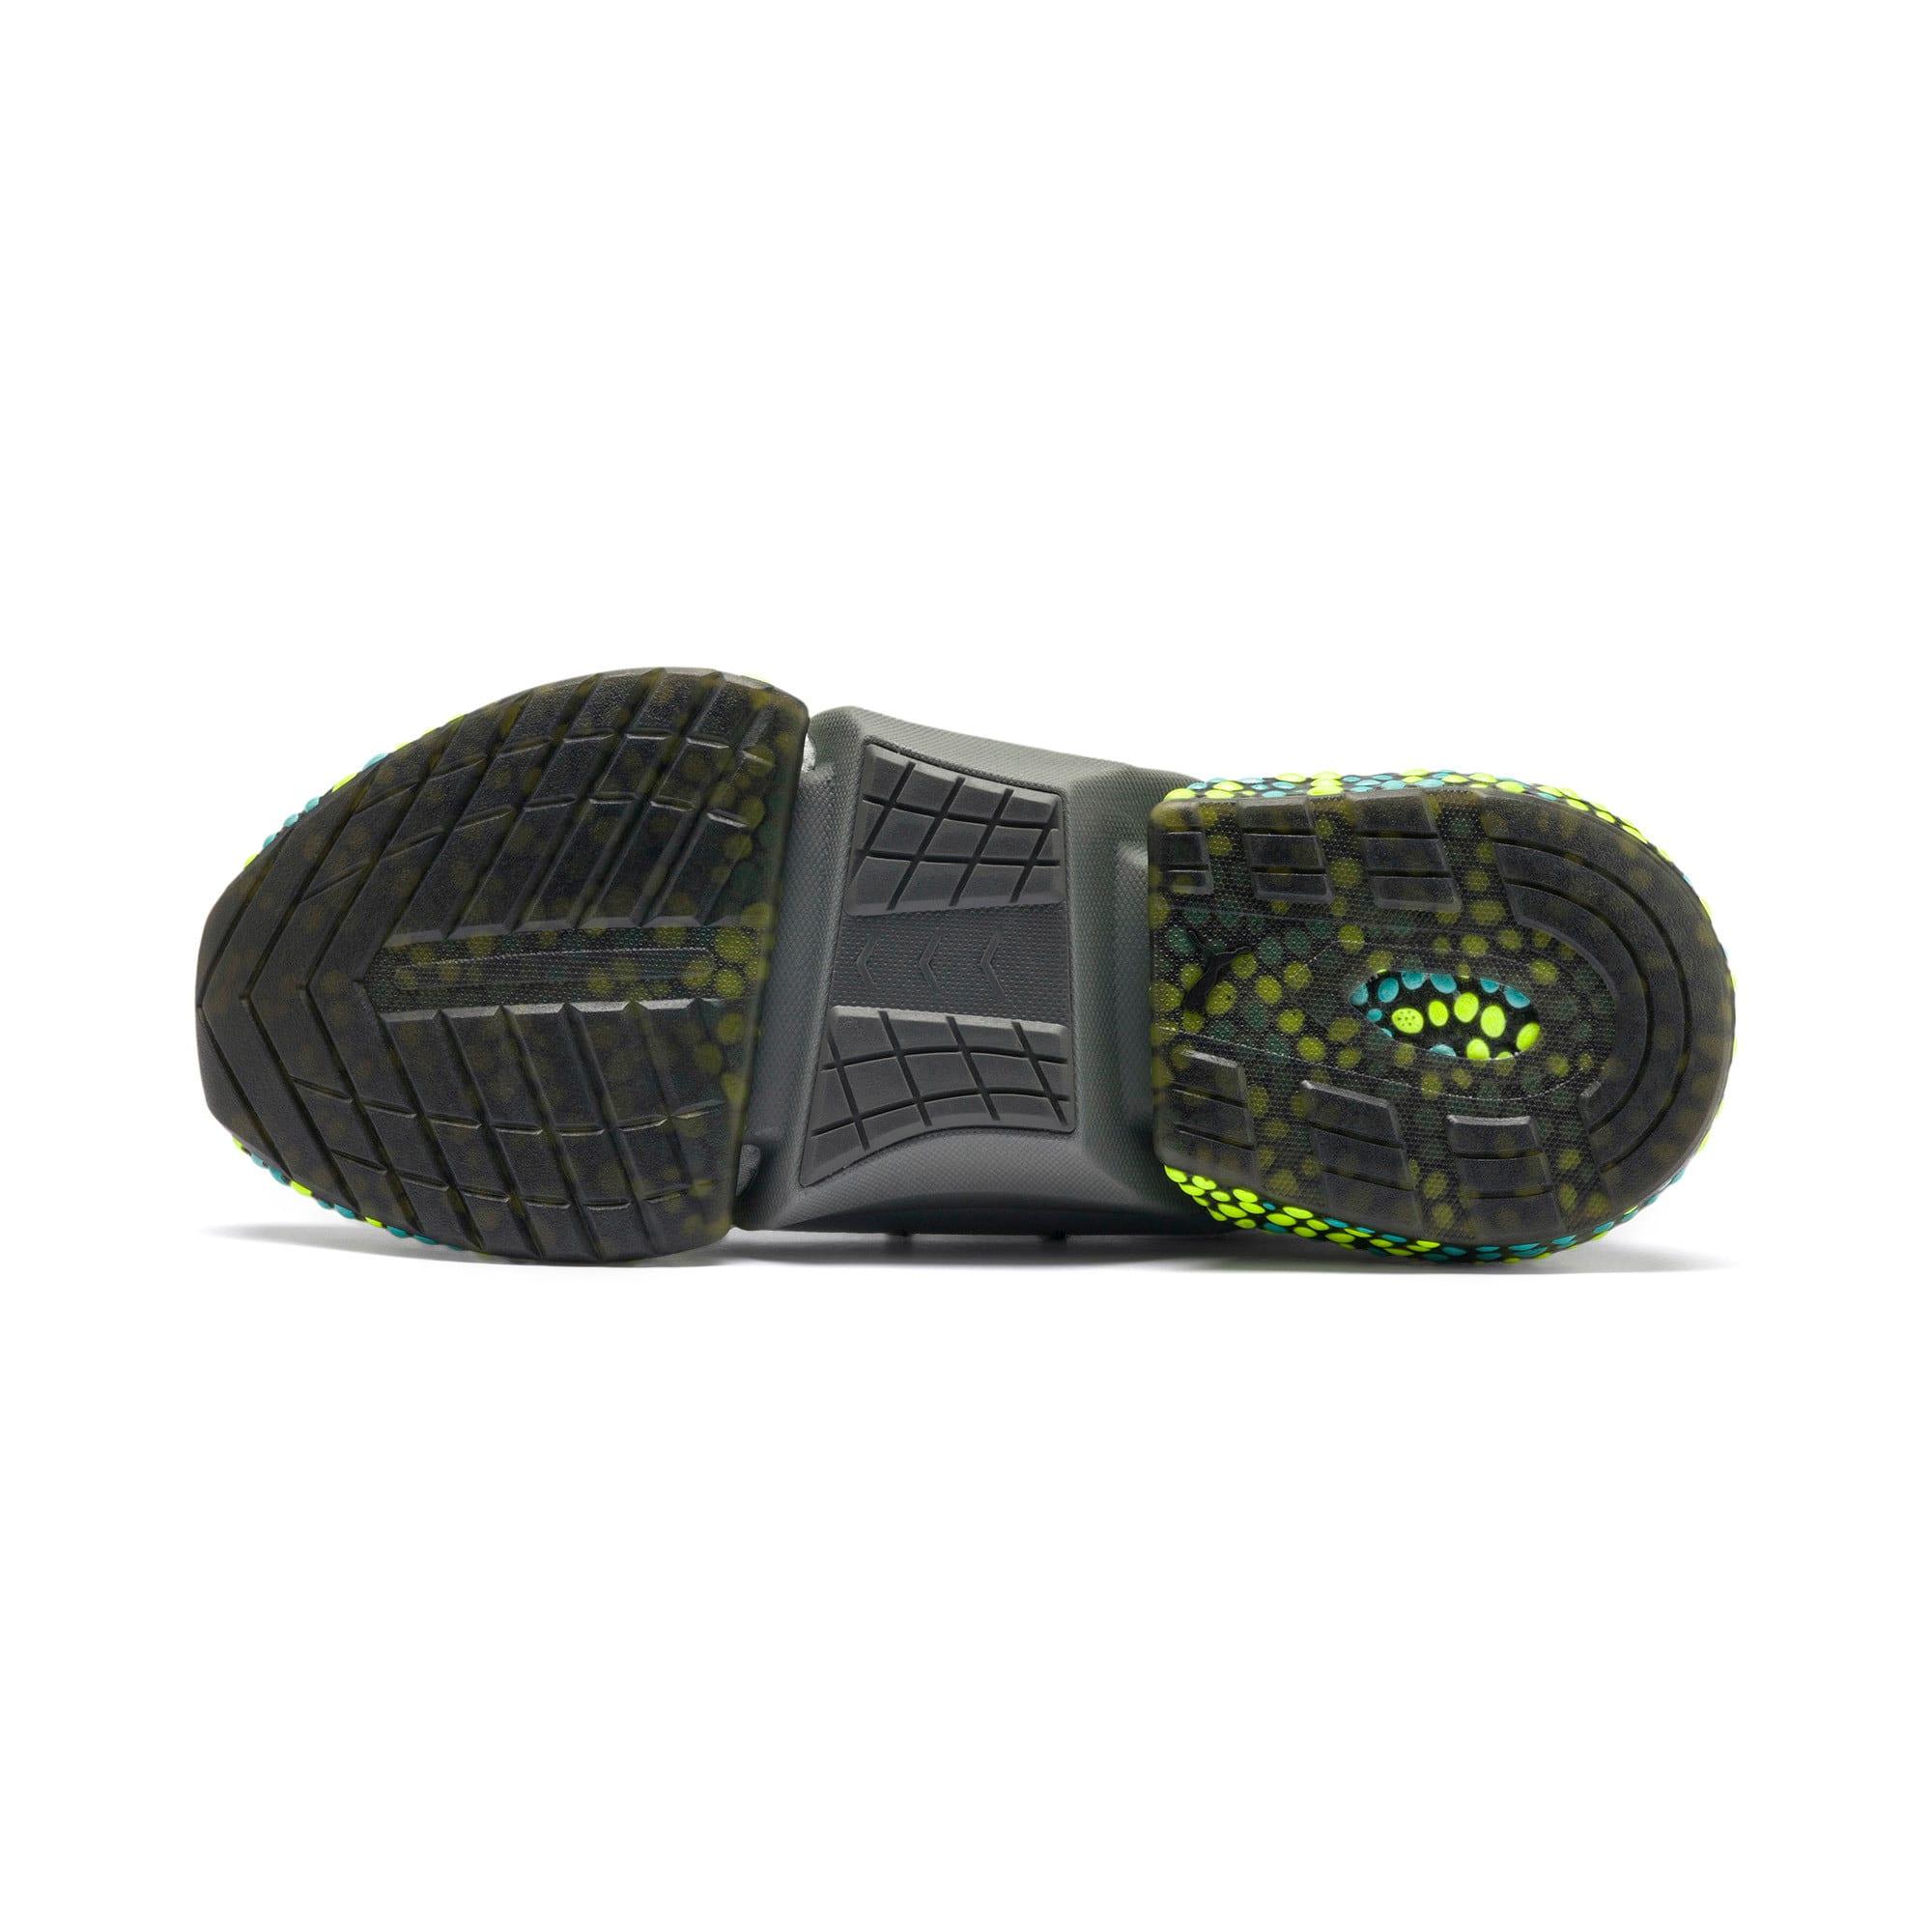 Thumbnail 5 of HYBRID Rocket Aero Men's Running Shoes, High Rise-CASTLEROCK, medium